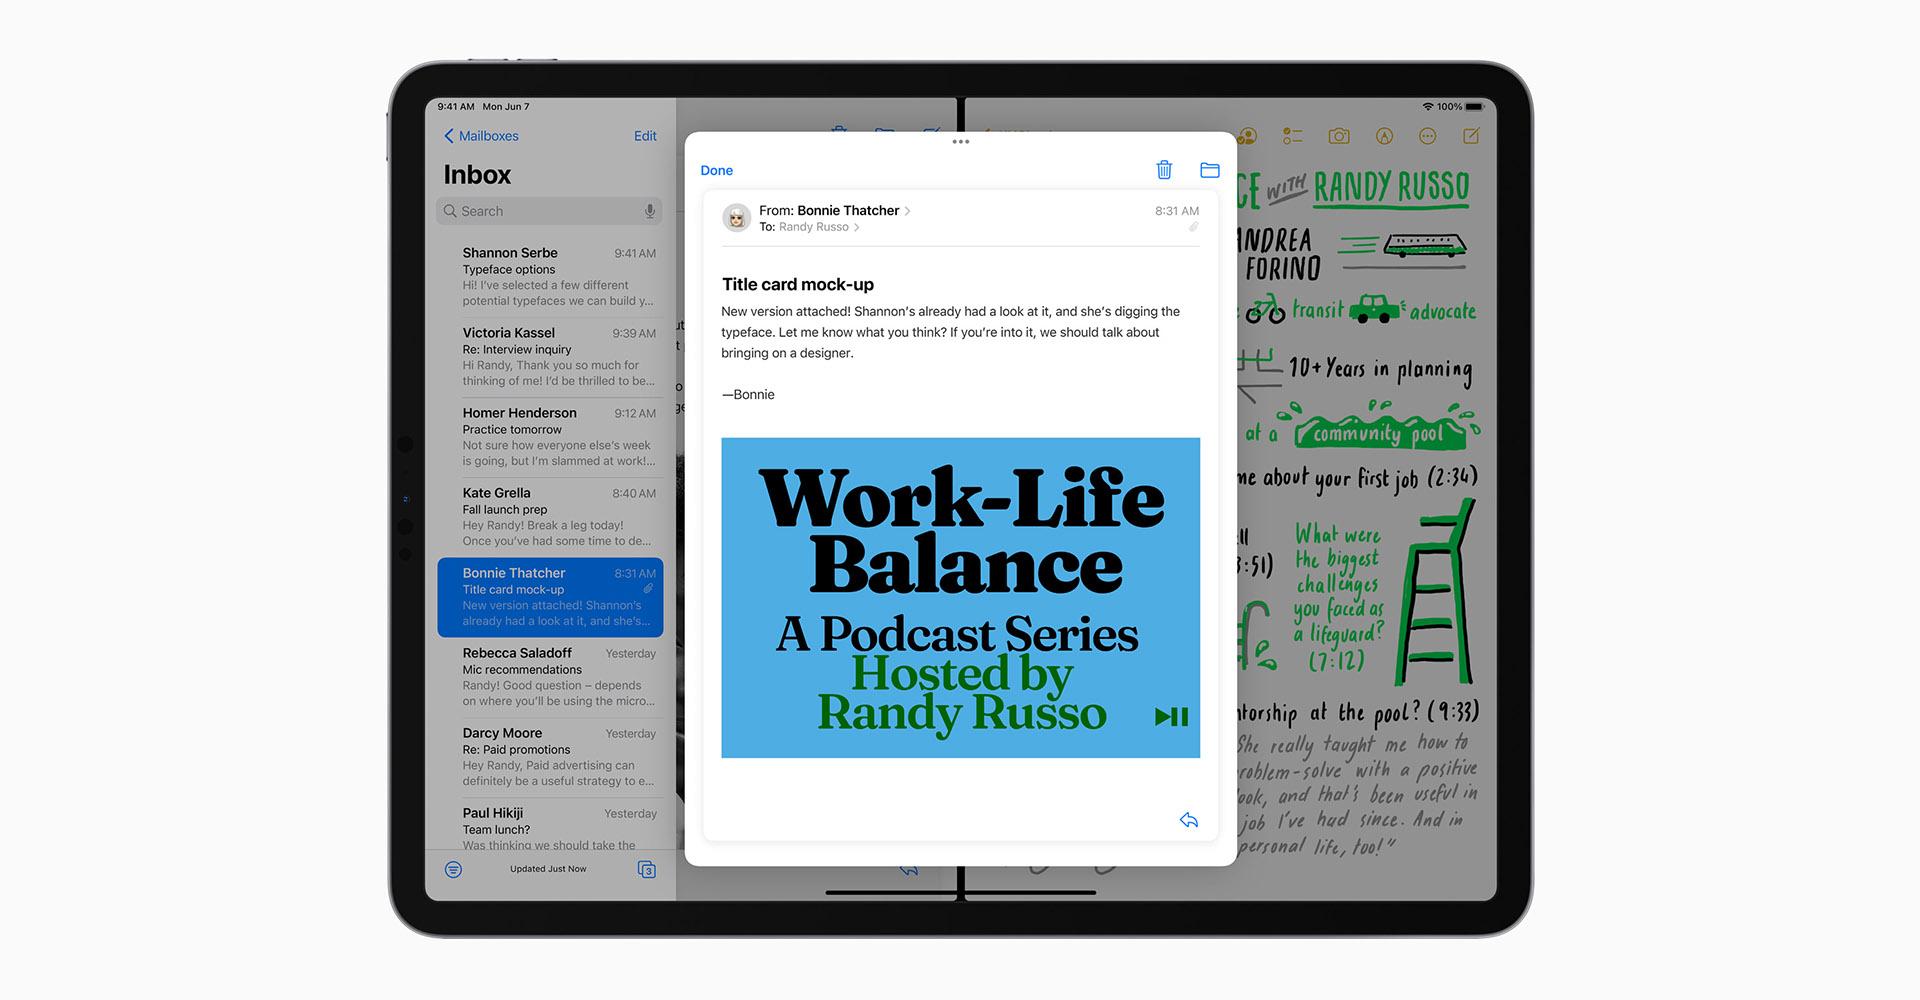 neue Split-View-Funktionen unter iPadOS 15